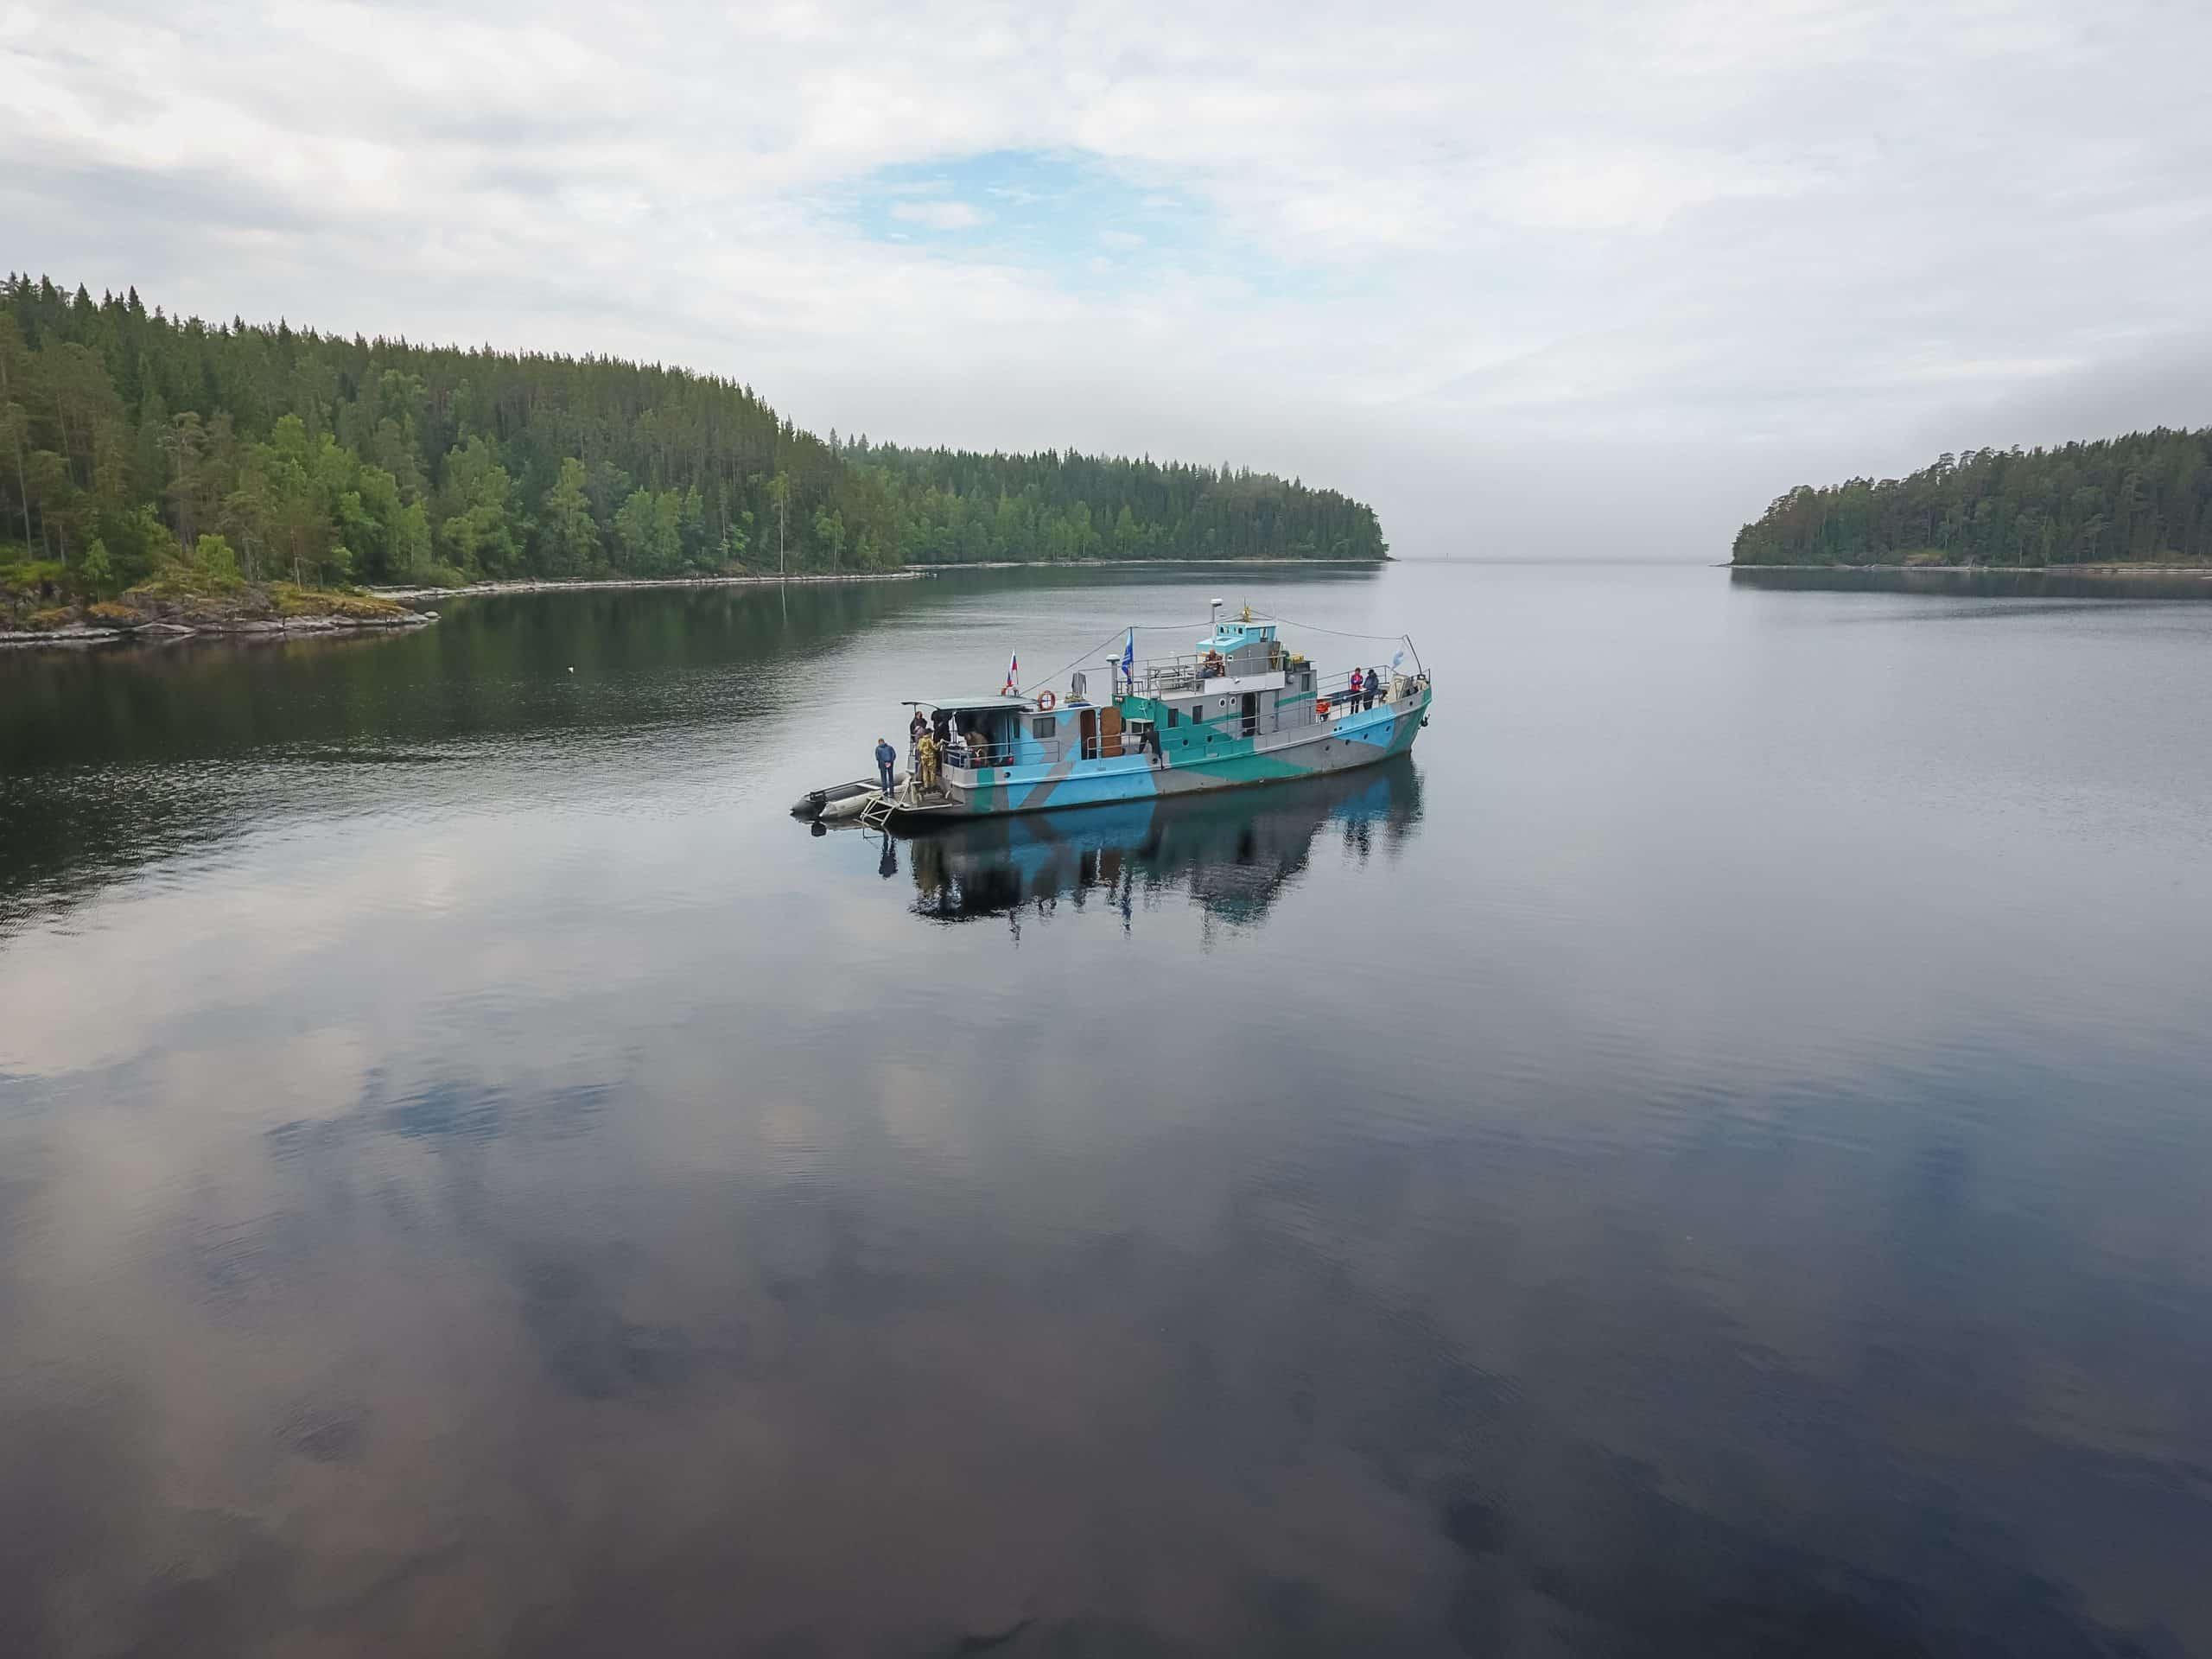 jednostka badawcza jezioro ładoga divers24.pl